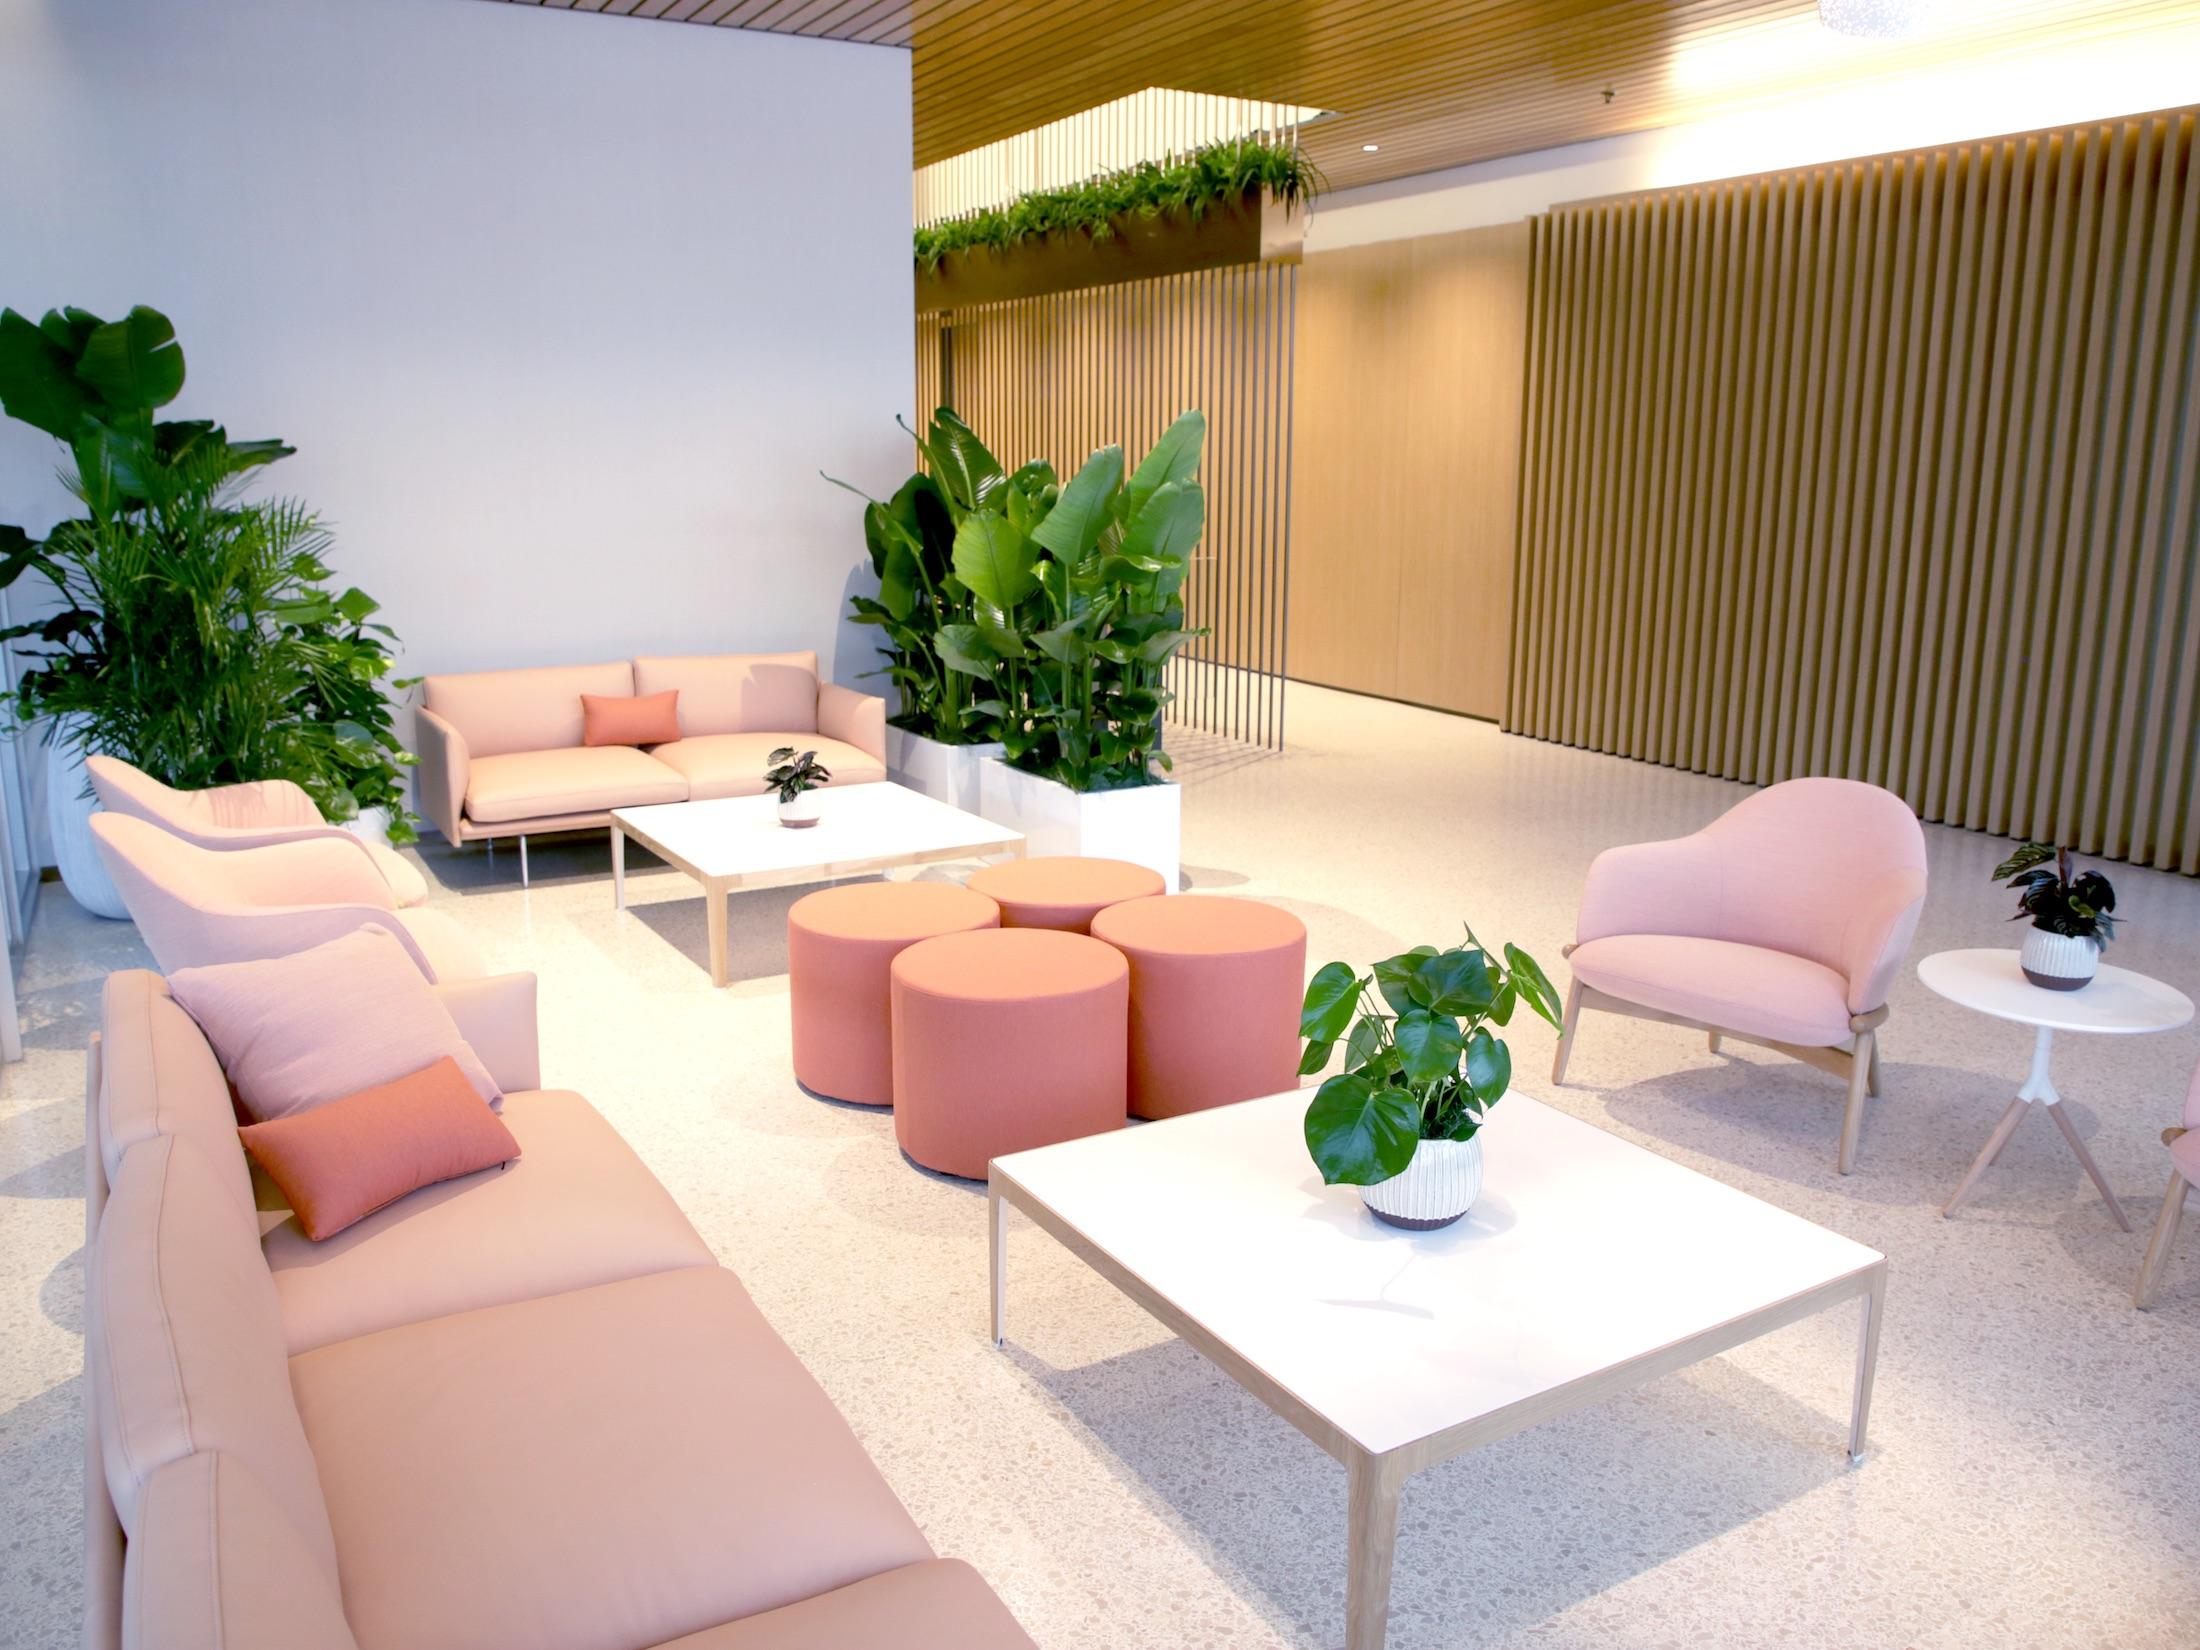 Gateway Center seating area